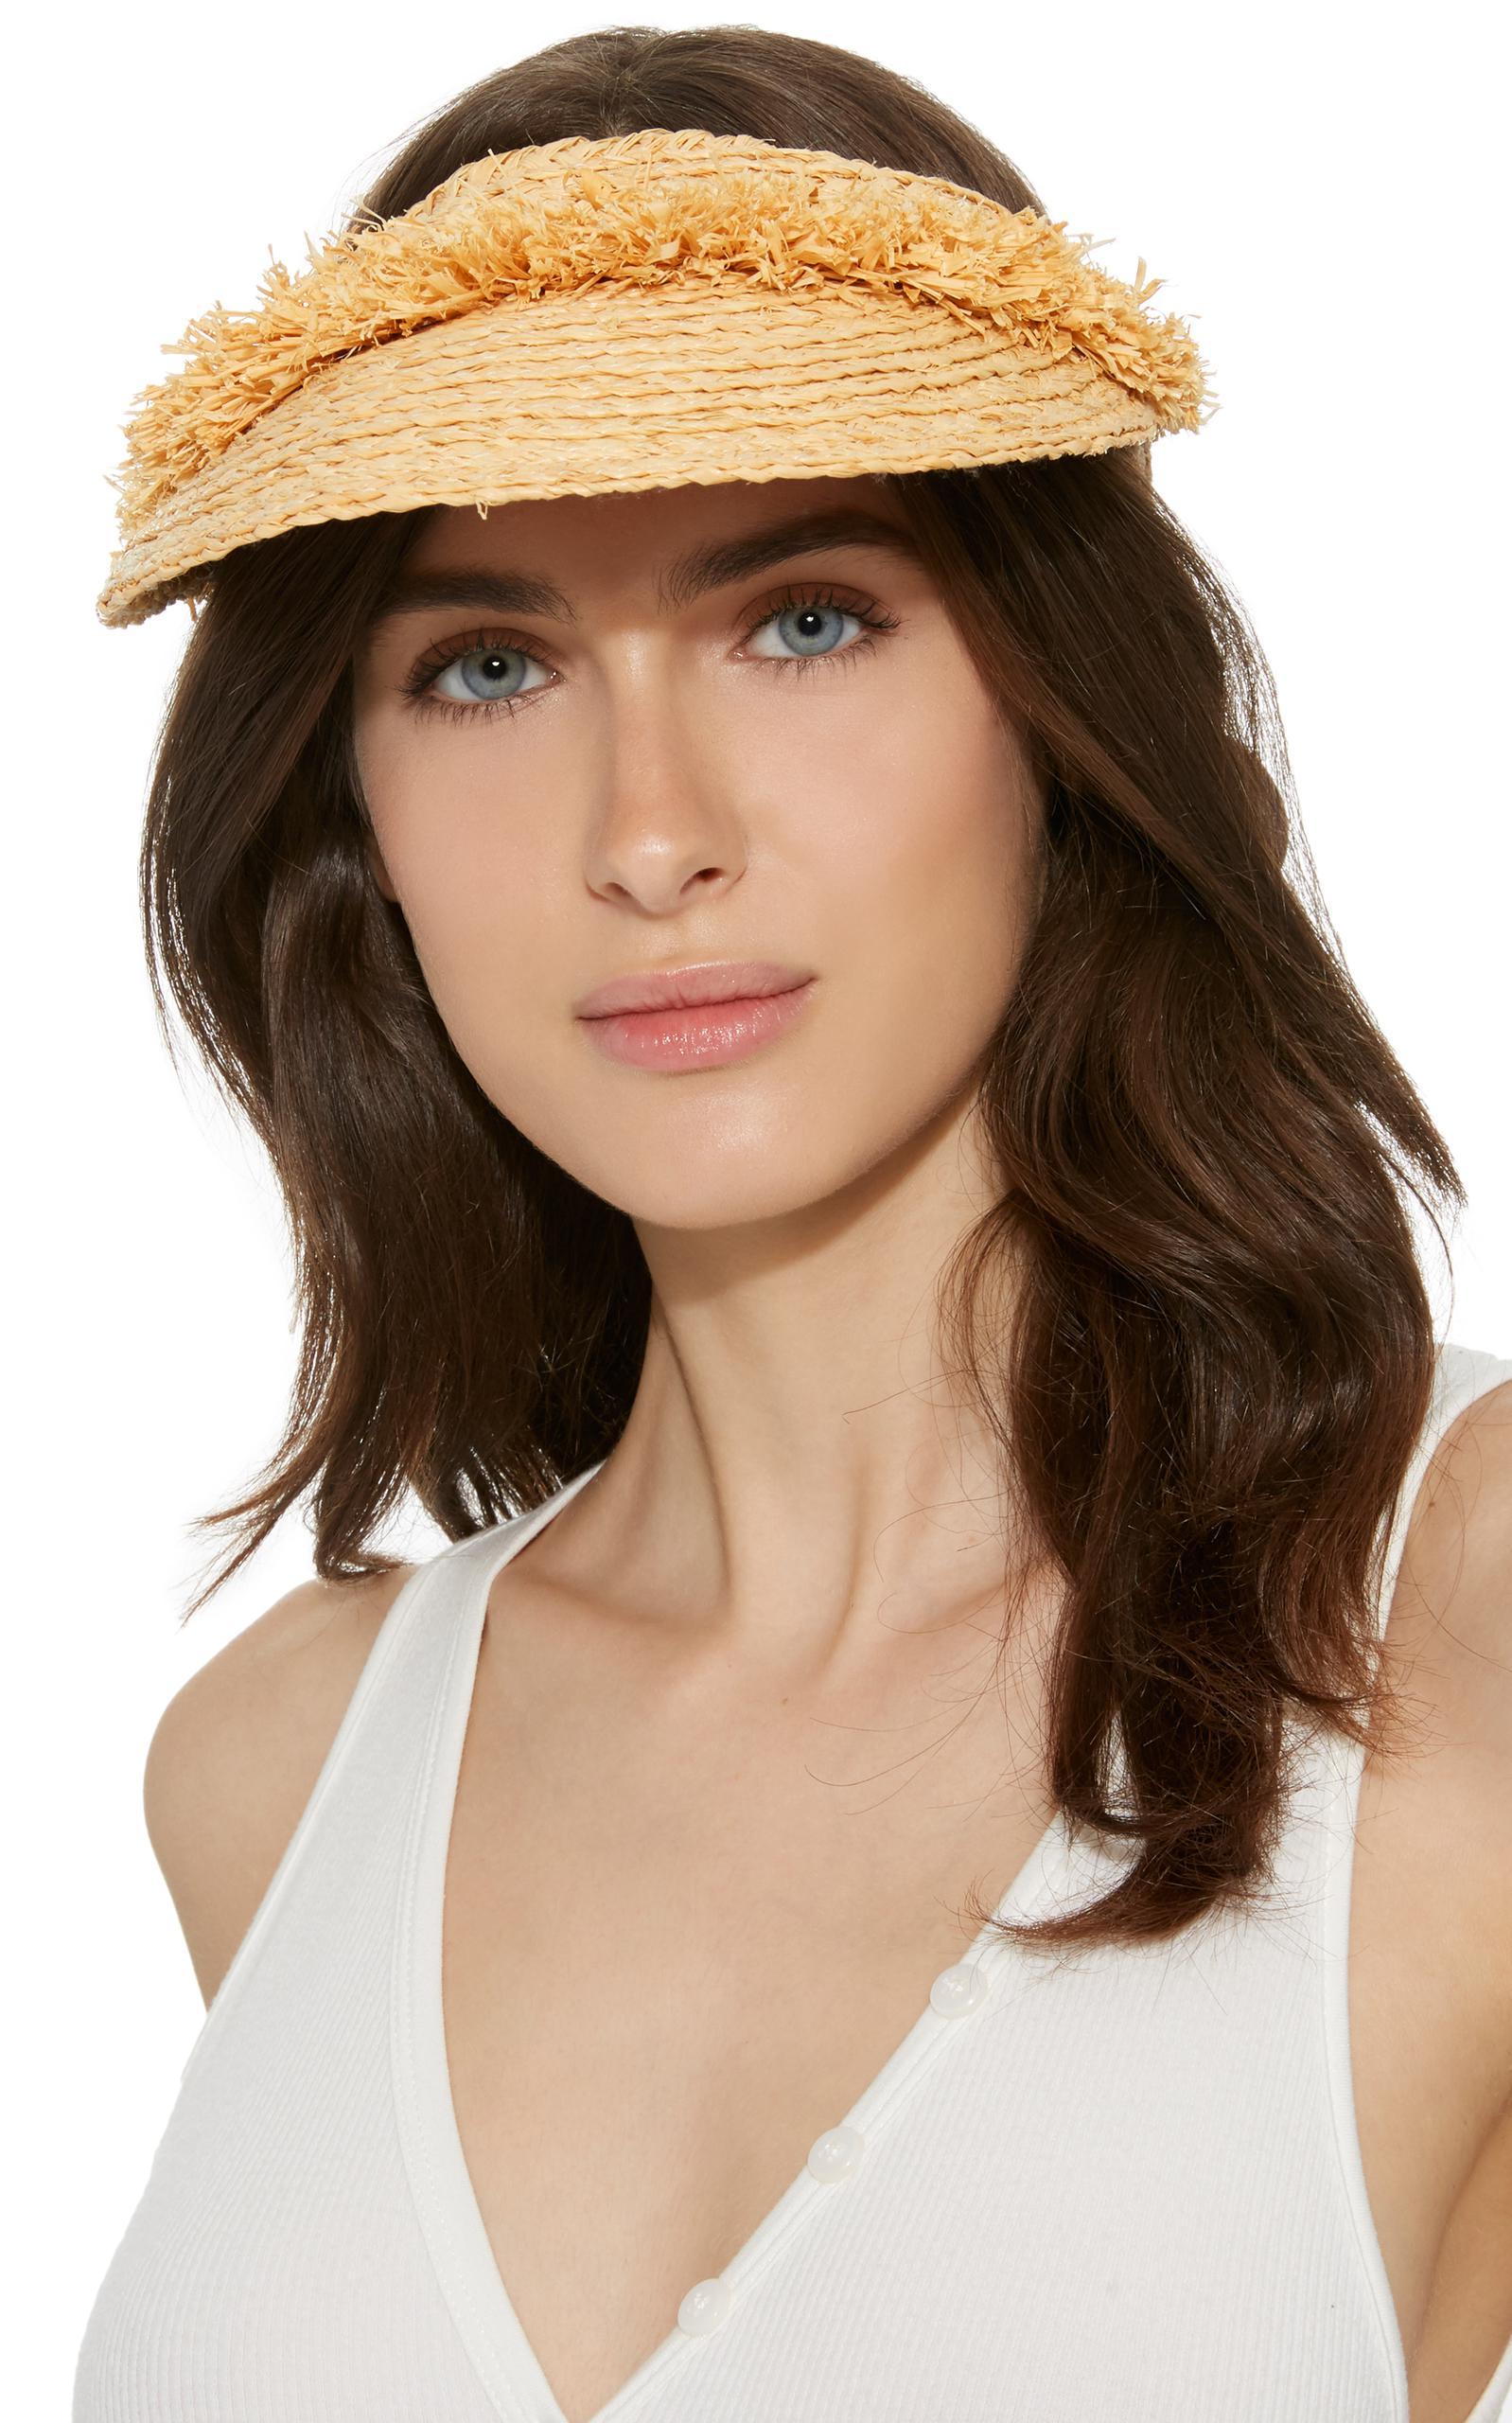 d3852fab1e Lola Hats Woven Rafia And Leather Visor Hat - Lyst